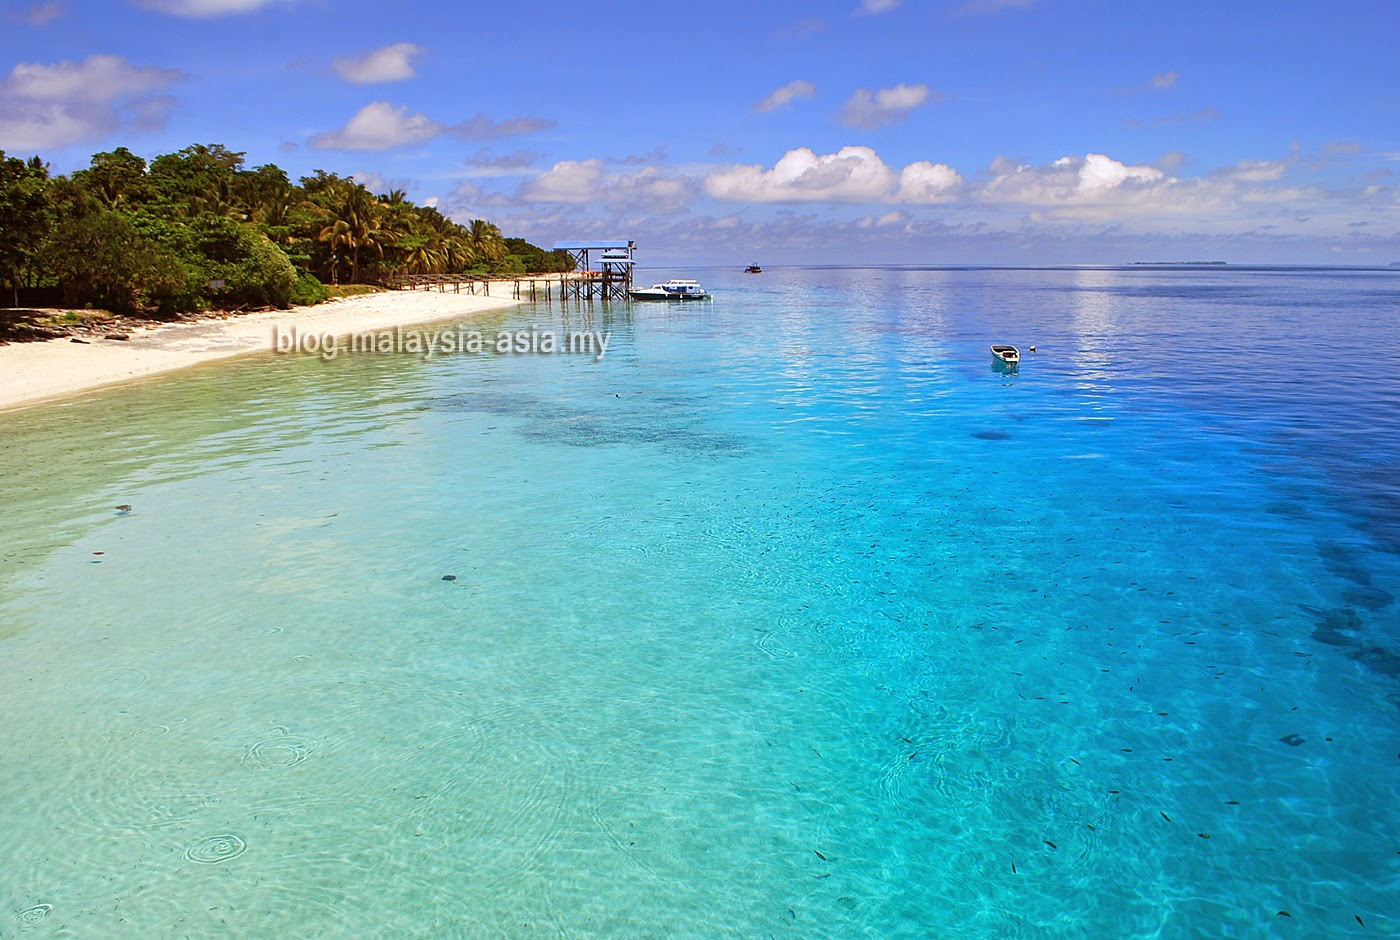 Photo of Mataking Island